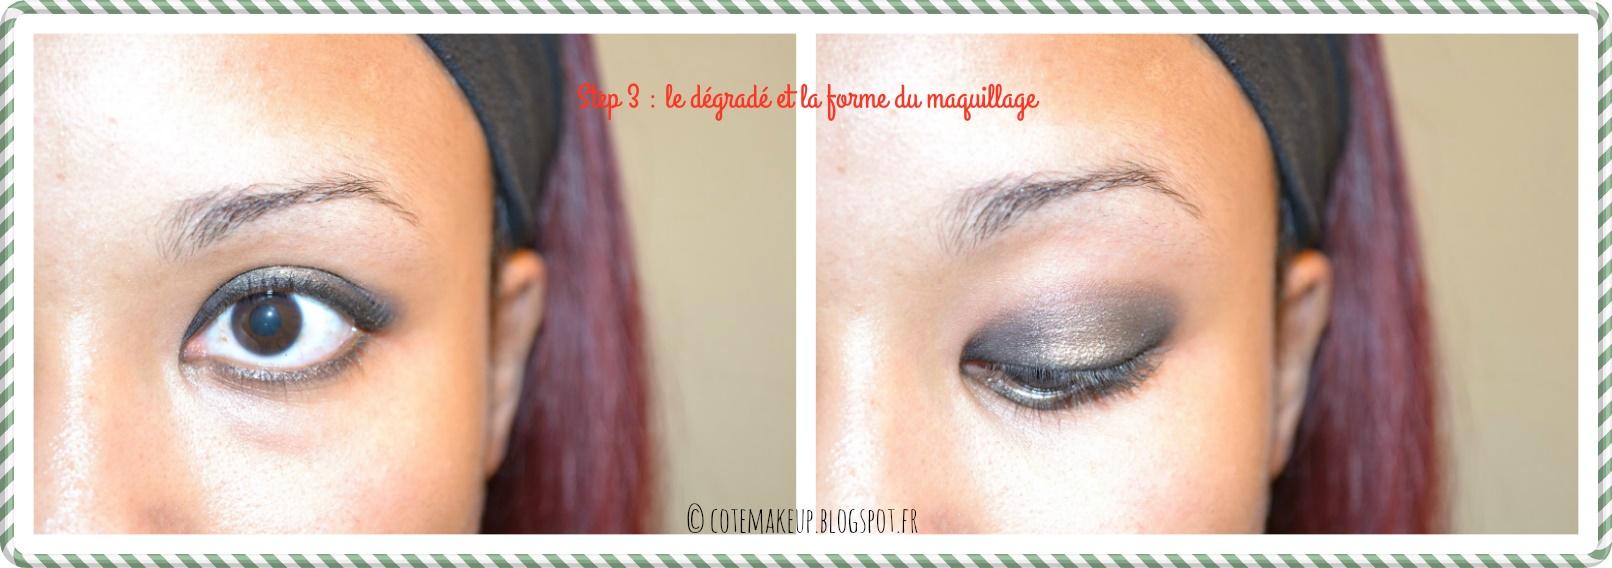 Tuto maquillage 3 smoky eyes noir revisit d une touche - Smoky eyes tuto ...